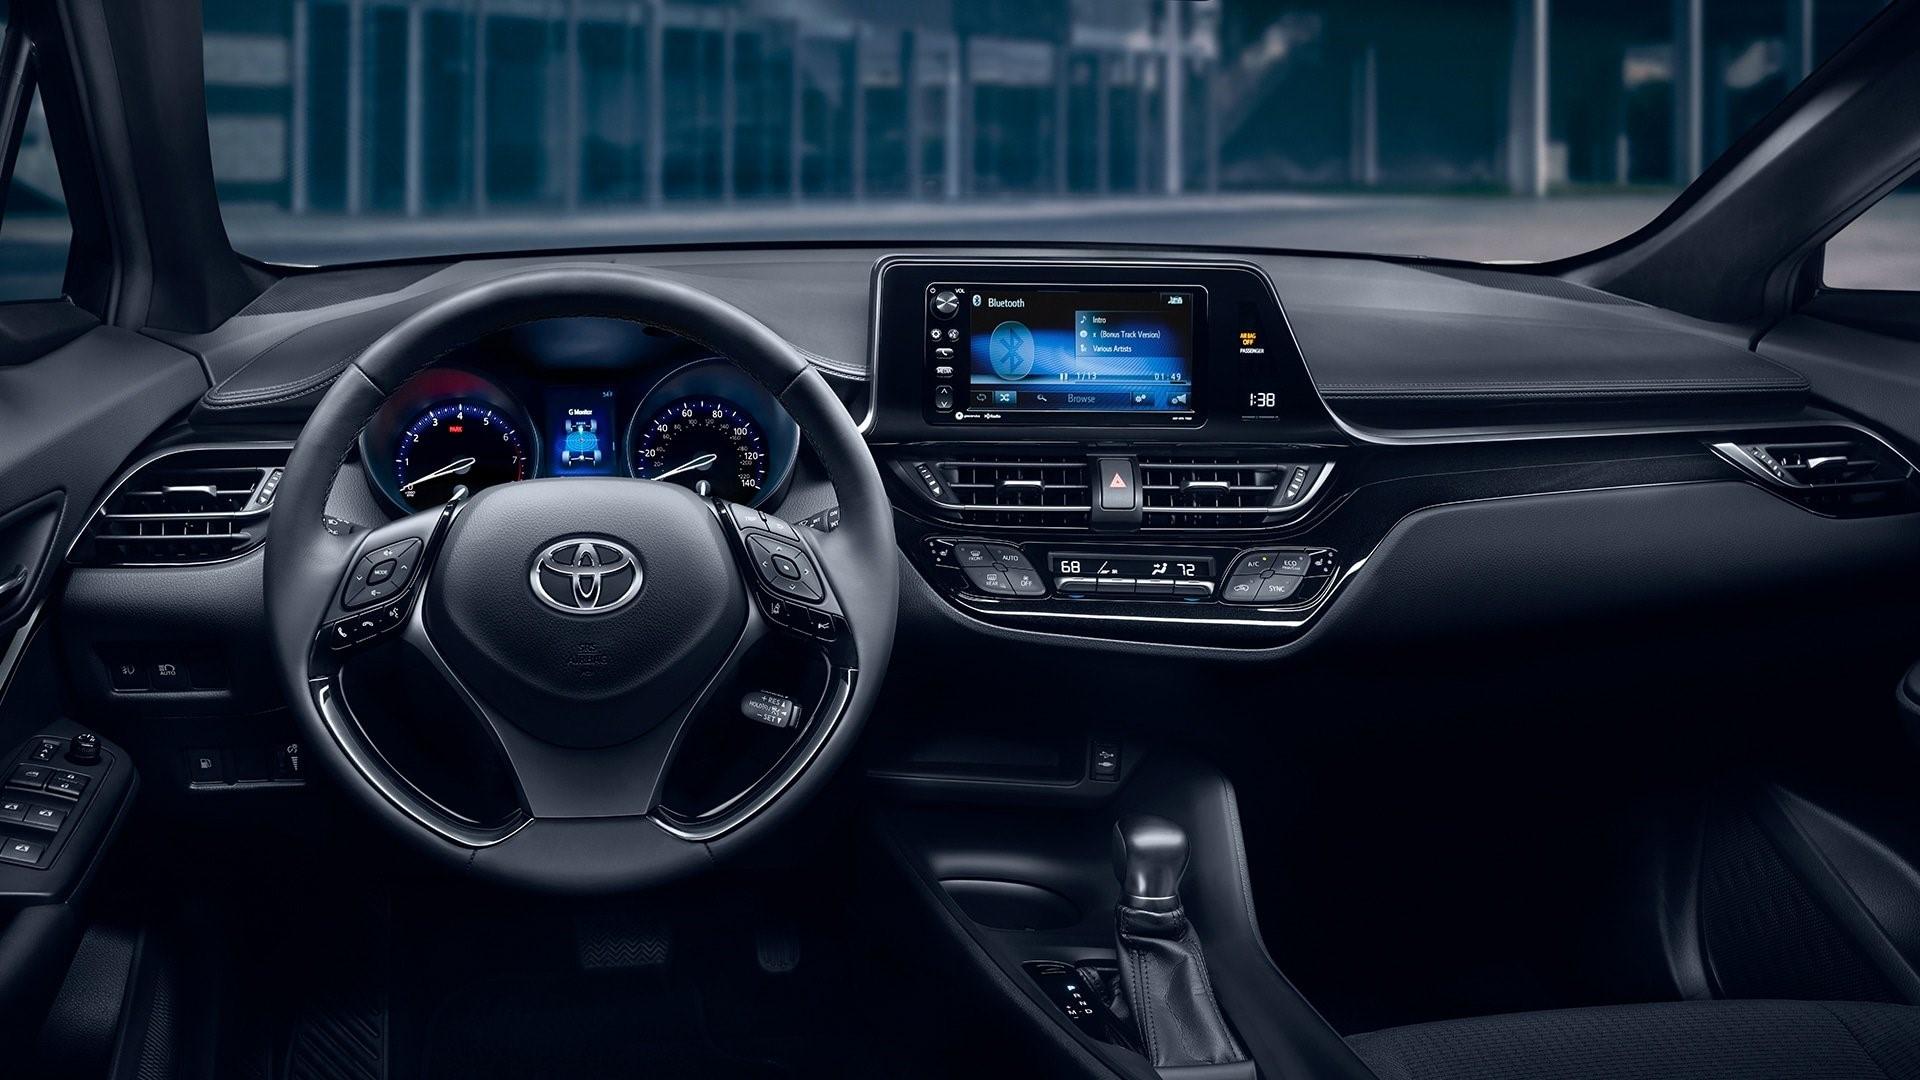 Kelebihan Kekurangan Toyota Chr 2019 Tangguh